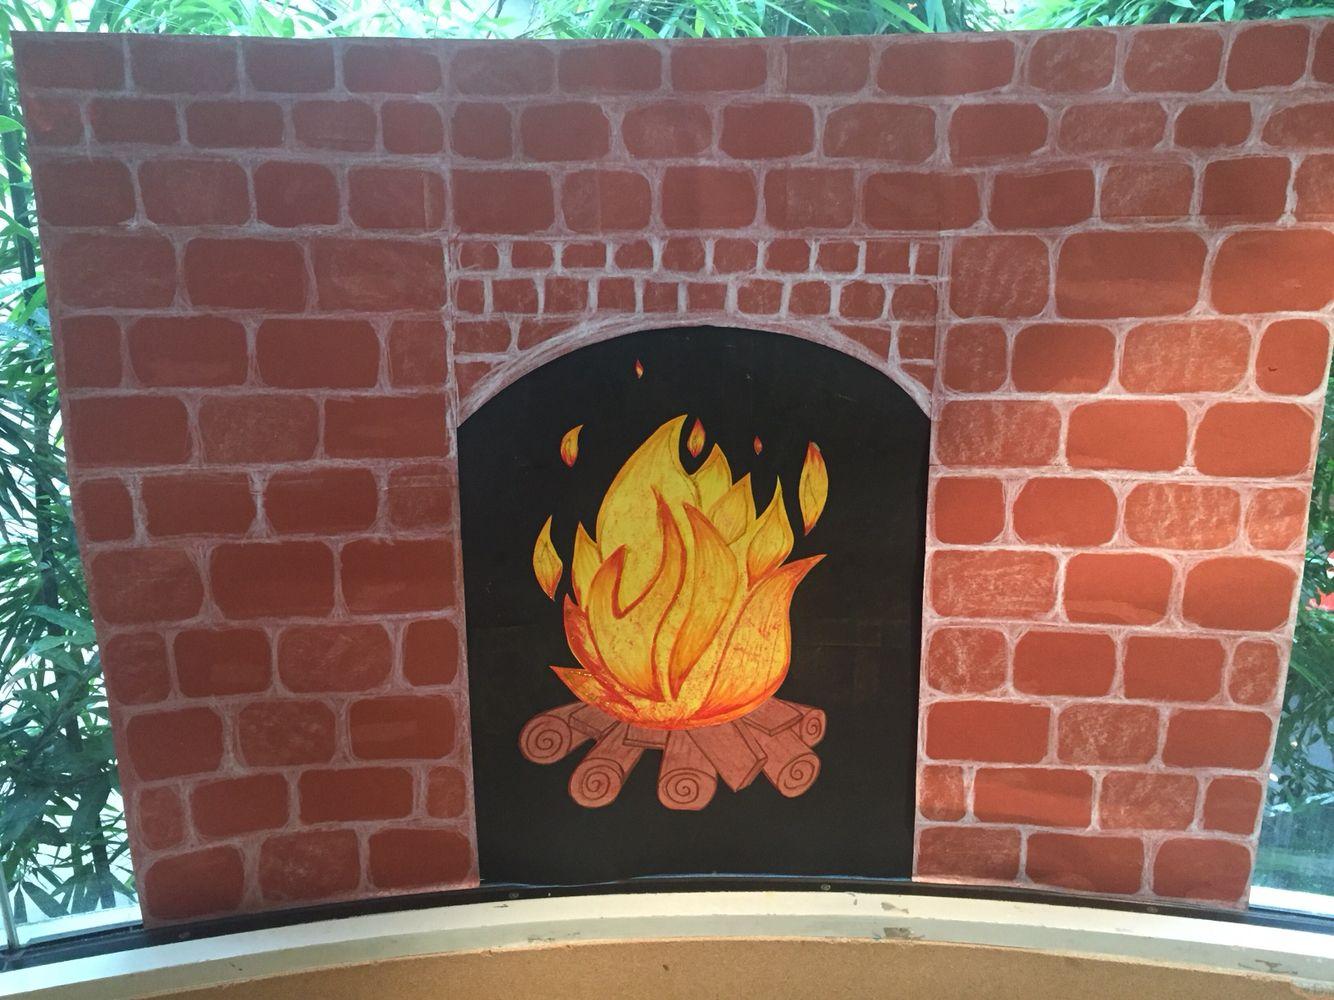 Kindergarten classroom window - Construction Paper Fireplace I Made For Our Kindergarten Classroom Window